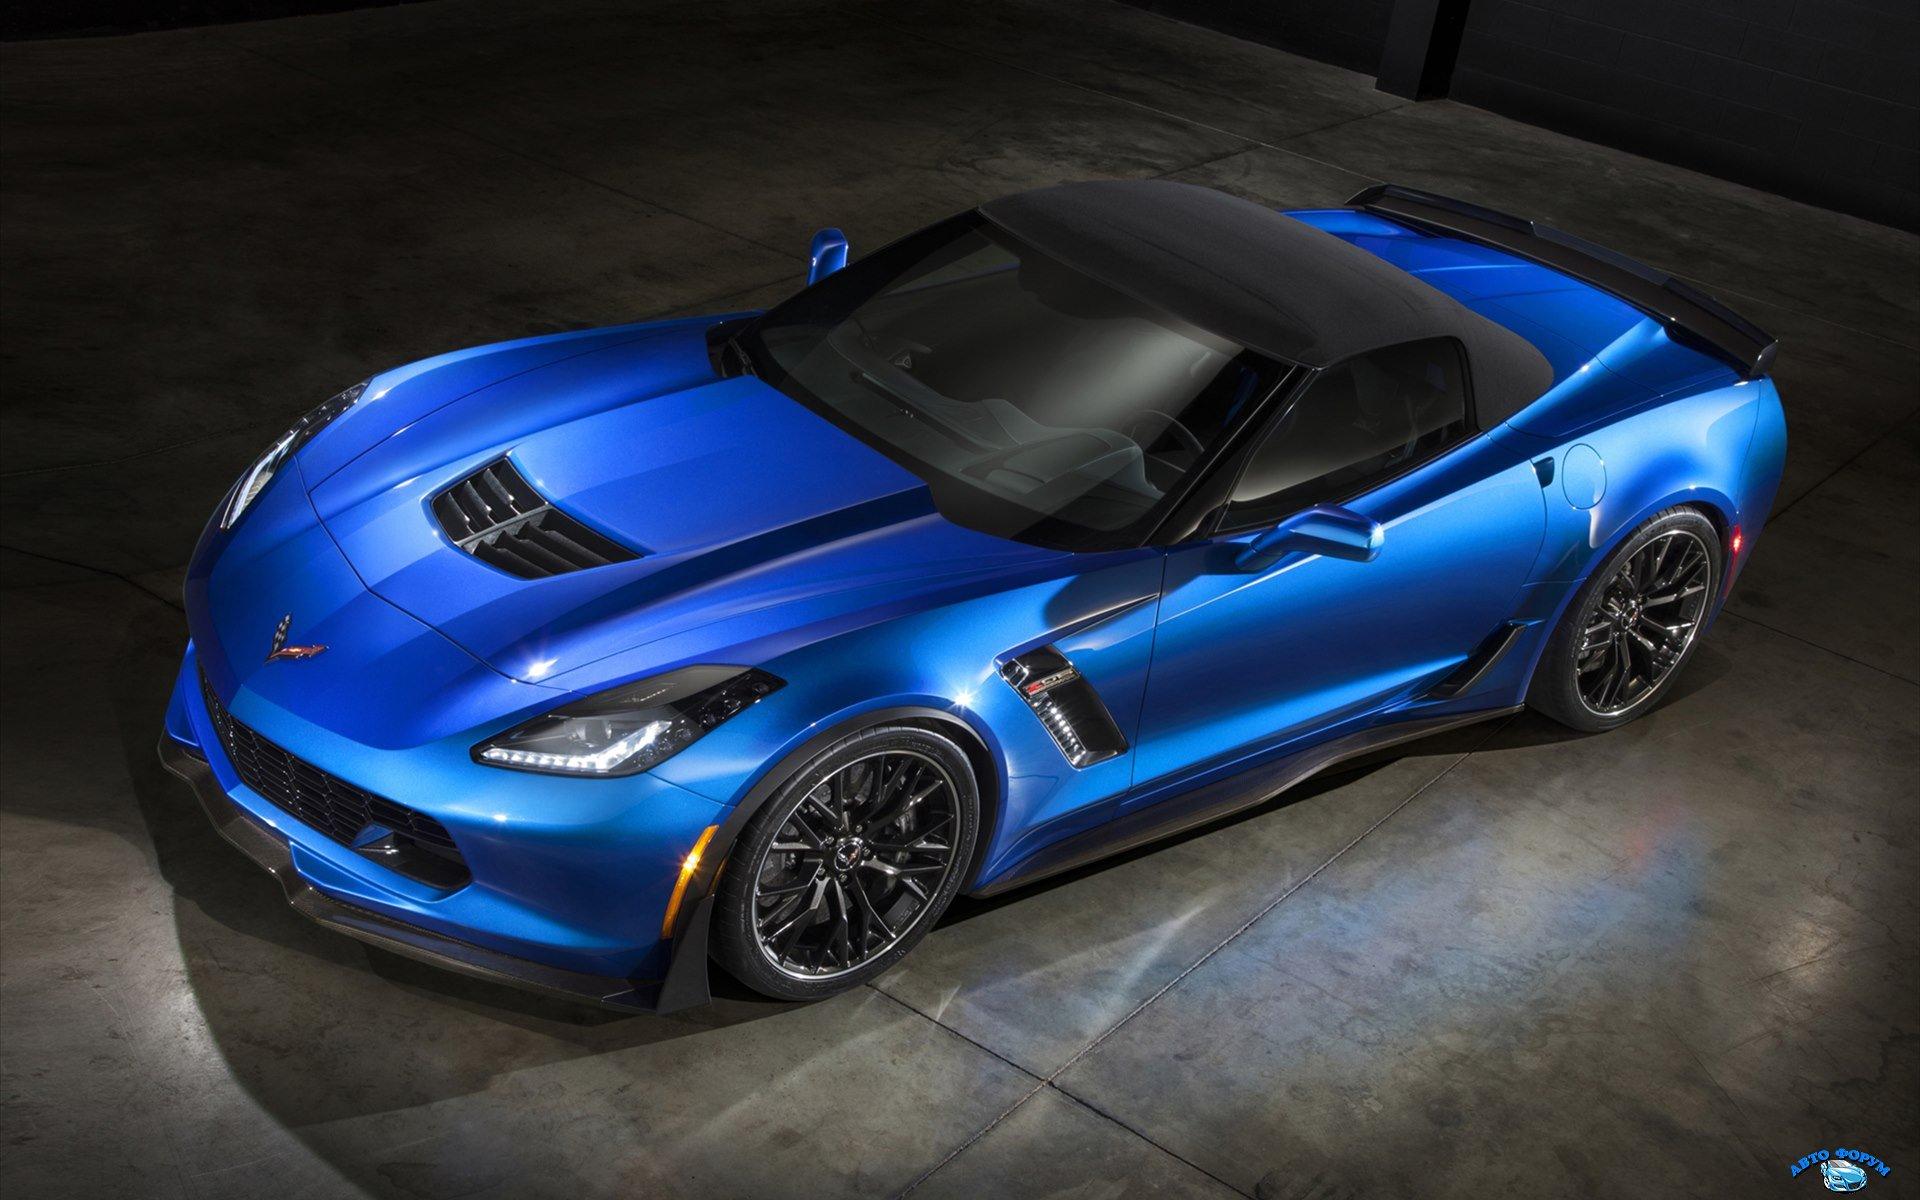 Chevrolet-Corvette-Z06-Convertible-2015-widescreen-04.jpg